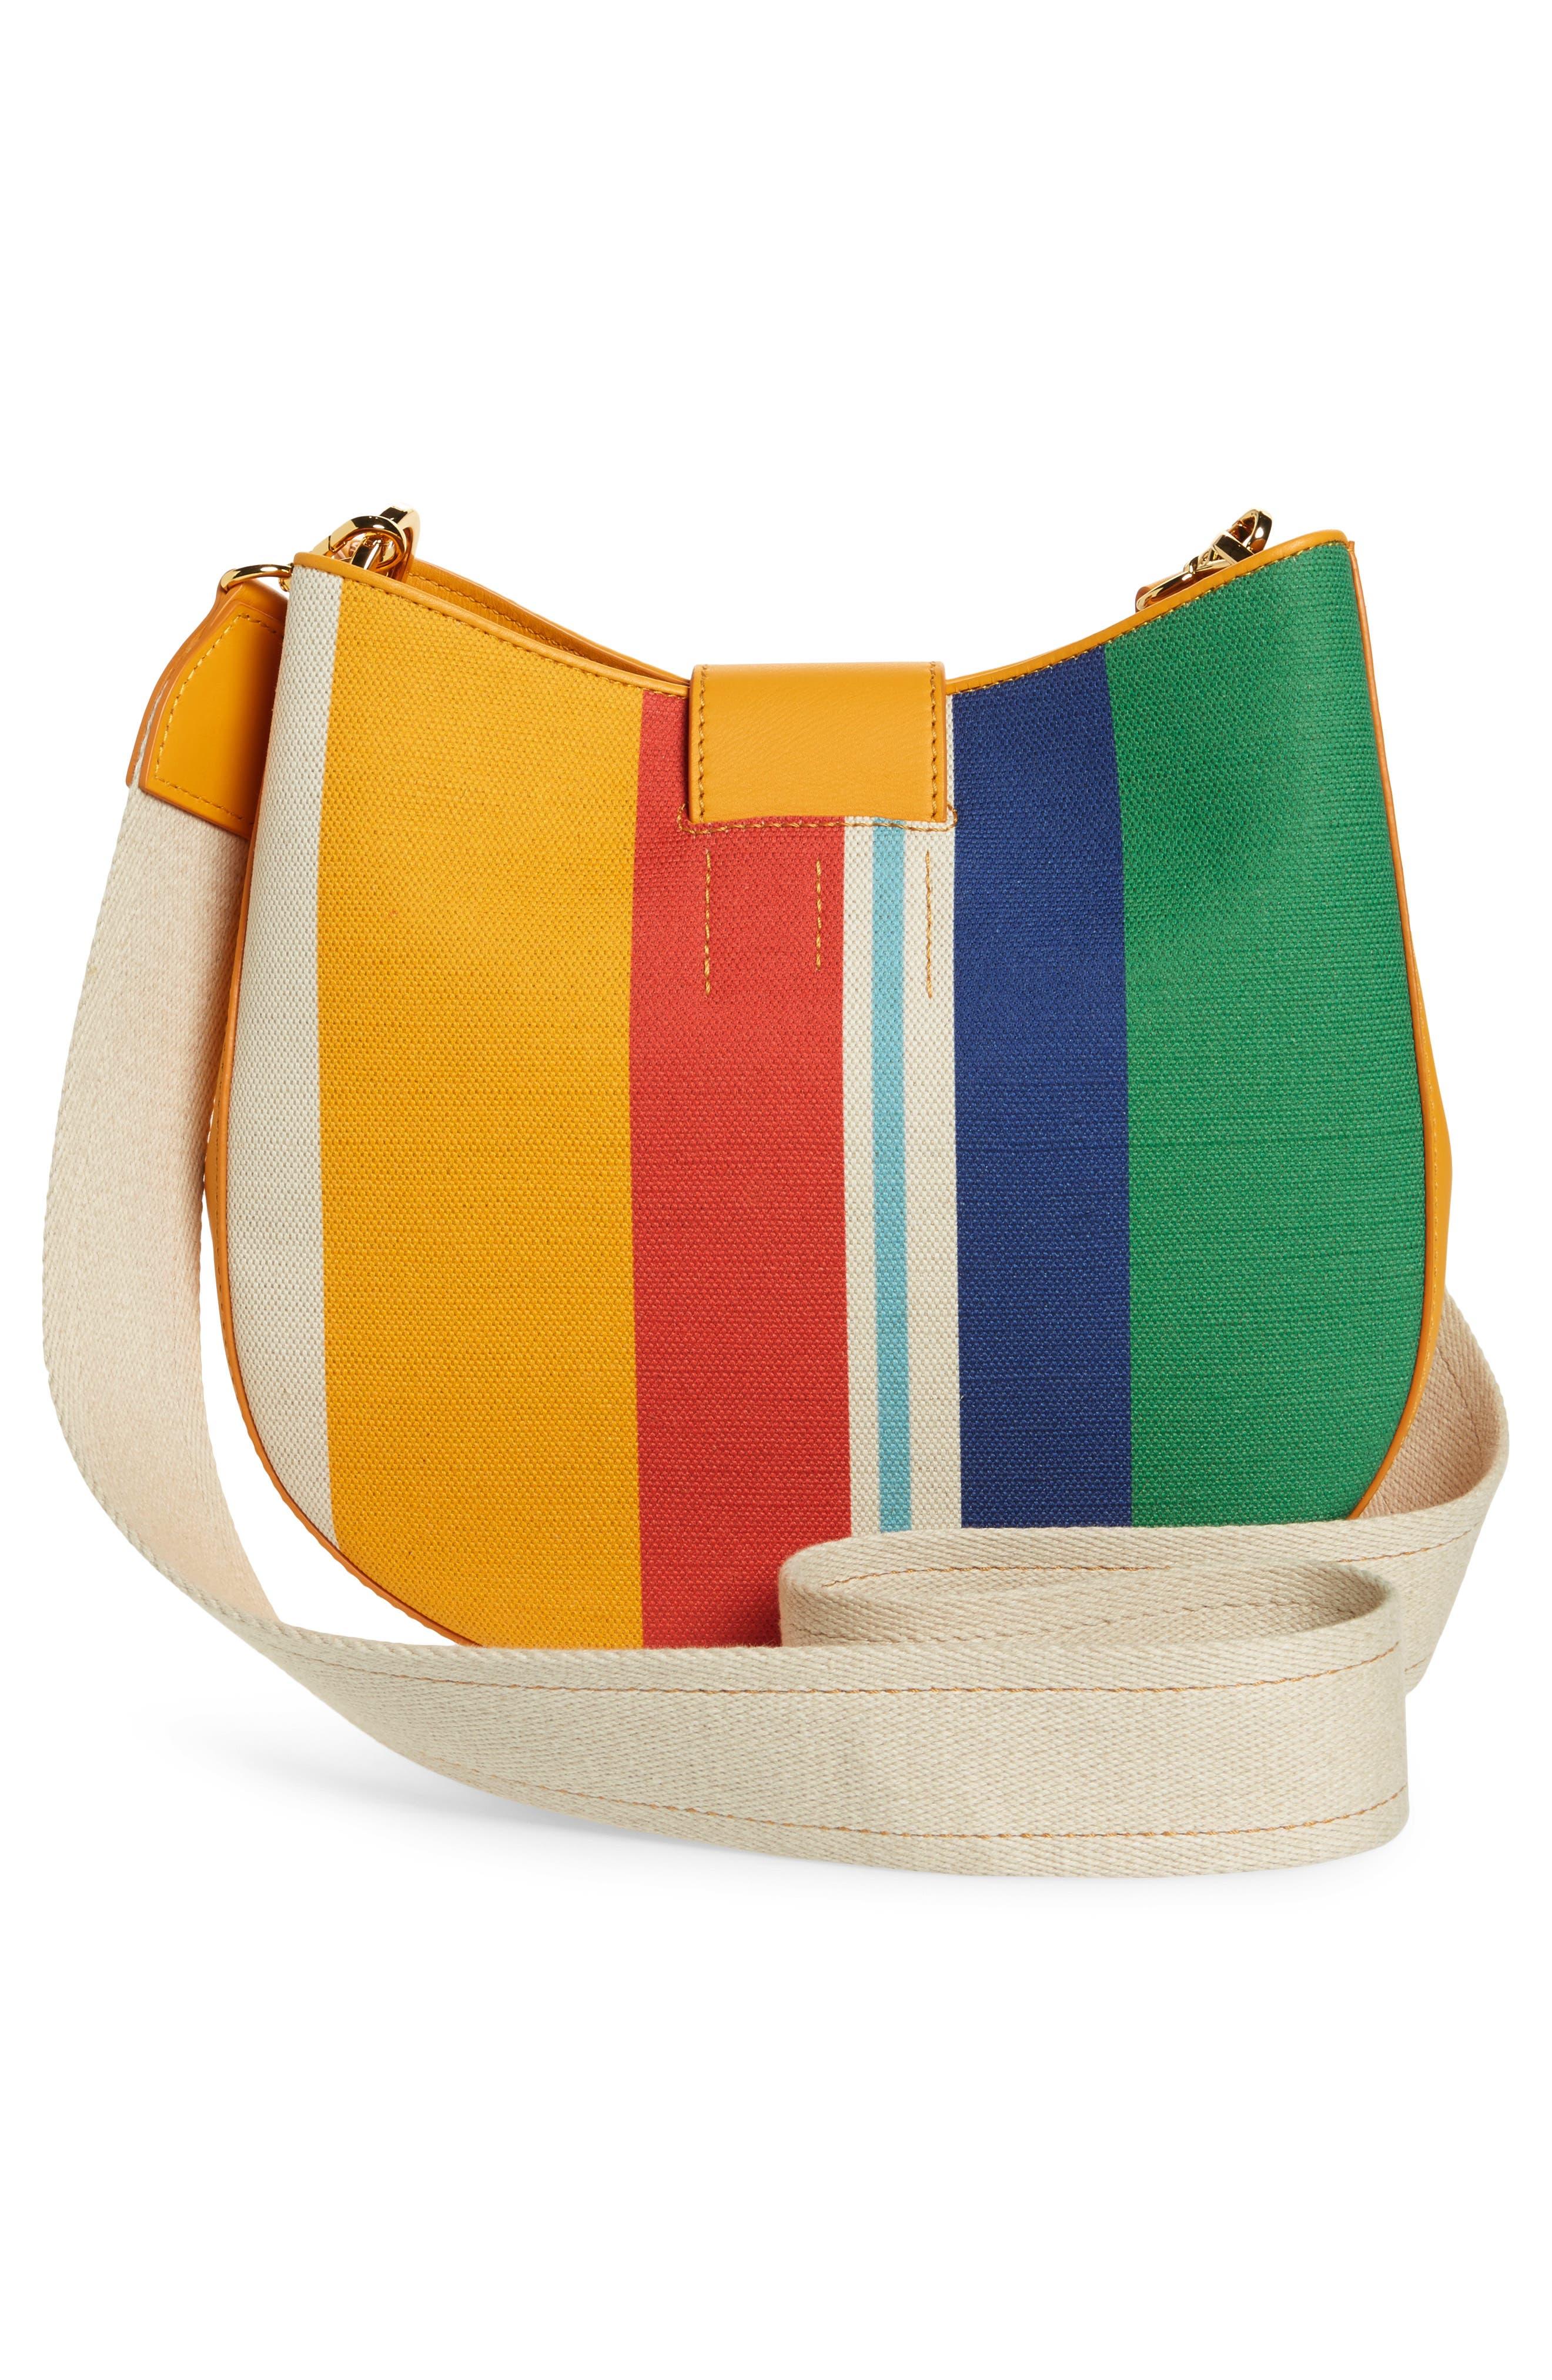 Medium Patricia Canvas Hobo Bag,                             Alternate thumbnail 3, color,                             Rainbow Yellow